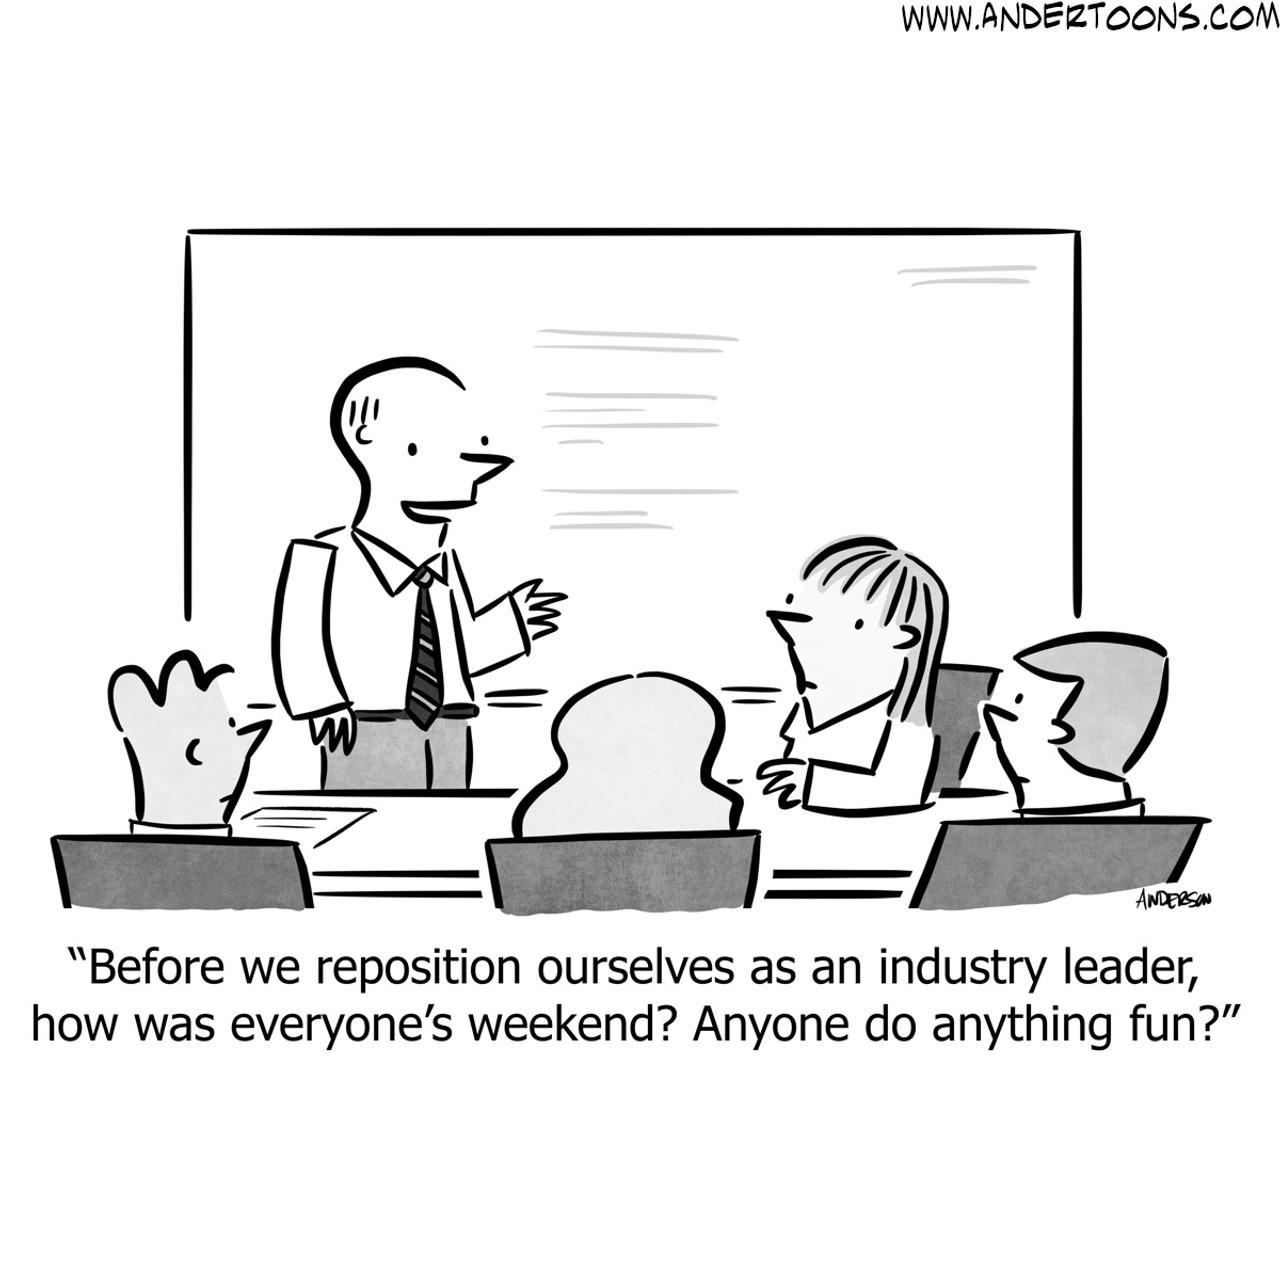 Leadership Cartoon #8668 - ANDERTOONS